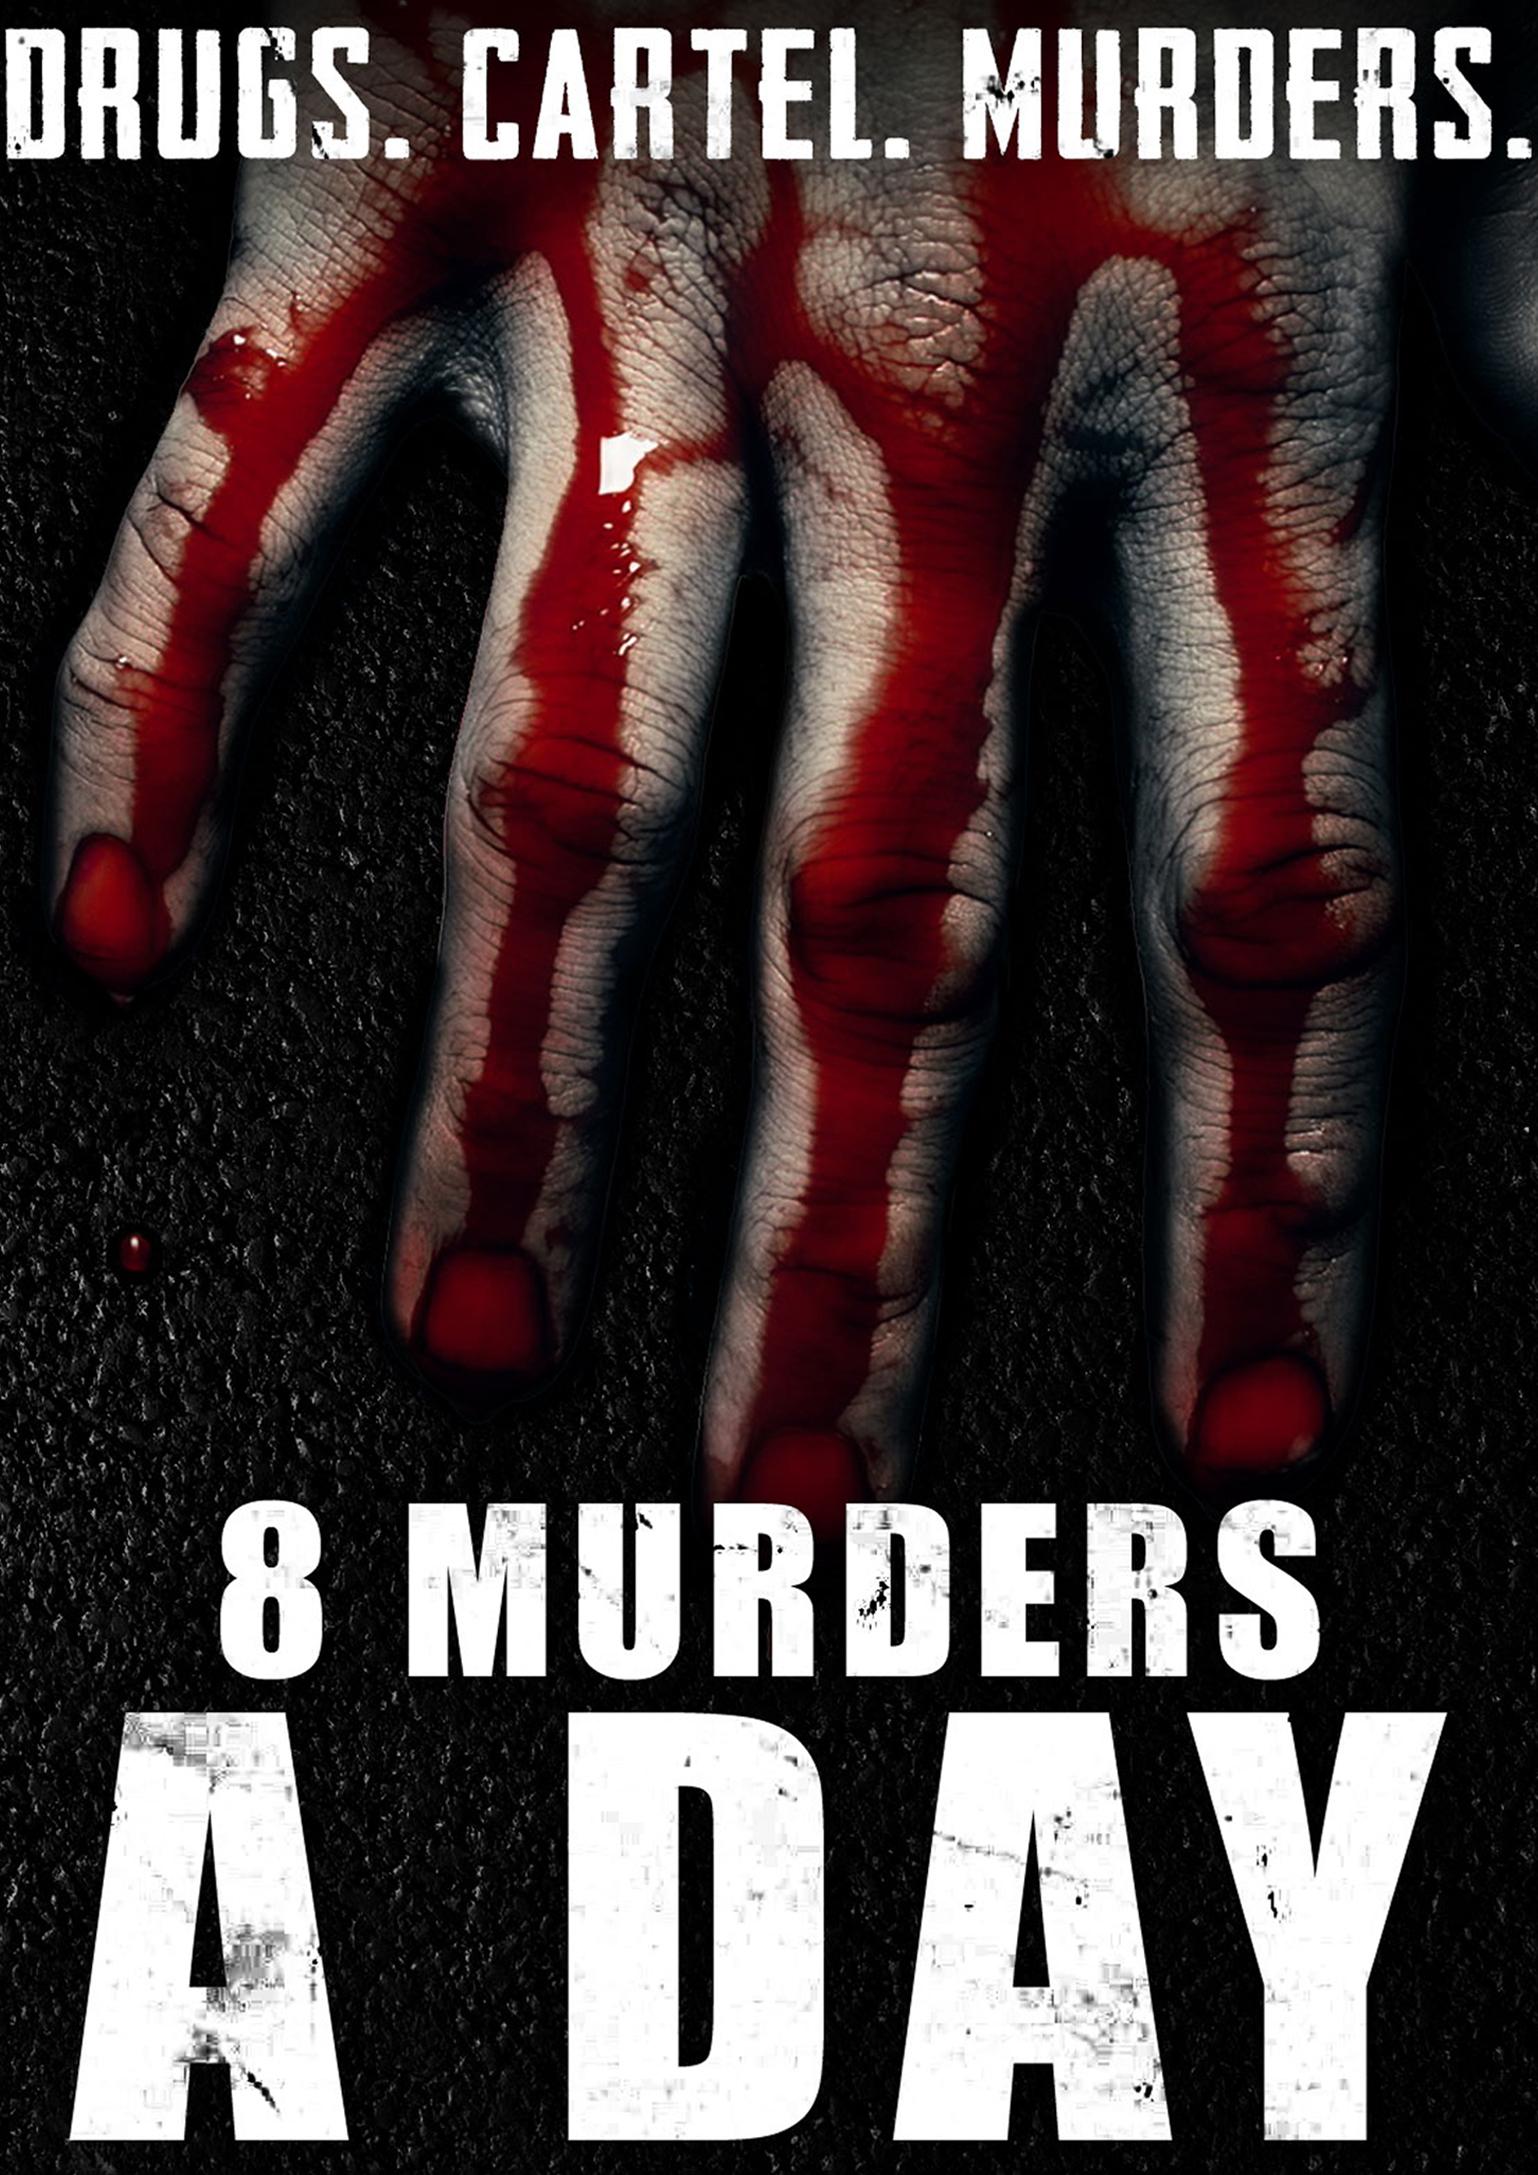 8 Murders A Day Mvd Entertainment Group B2b